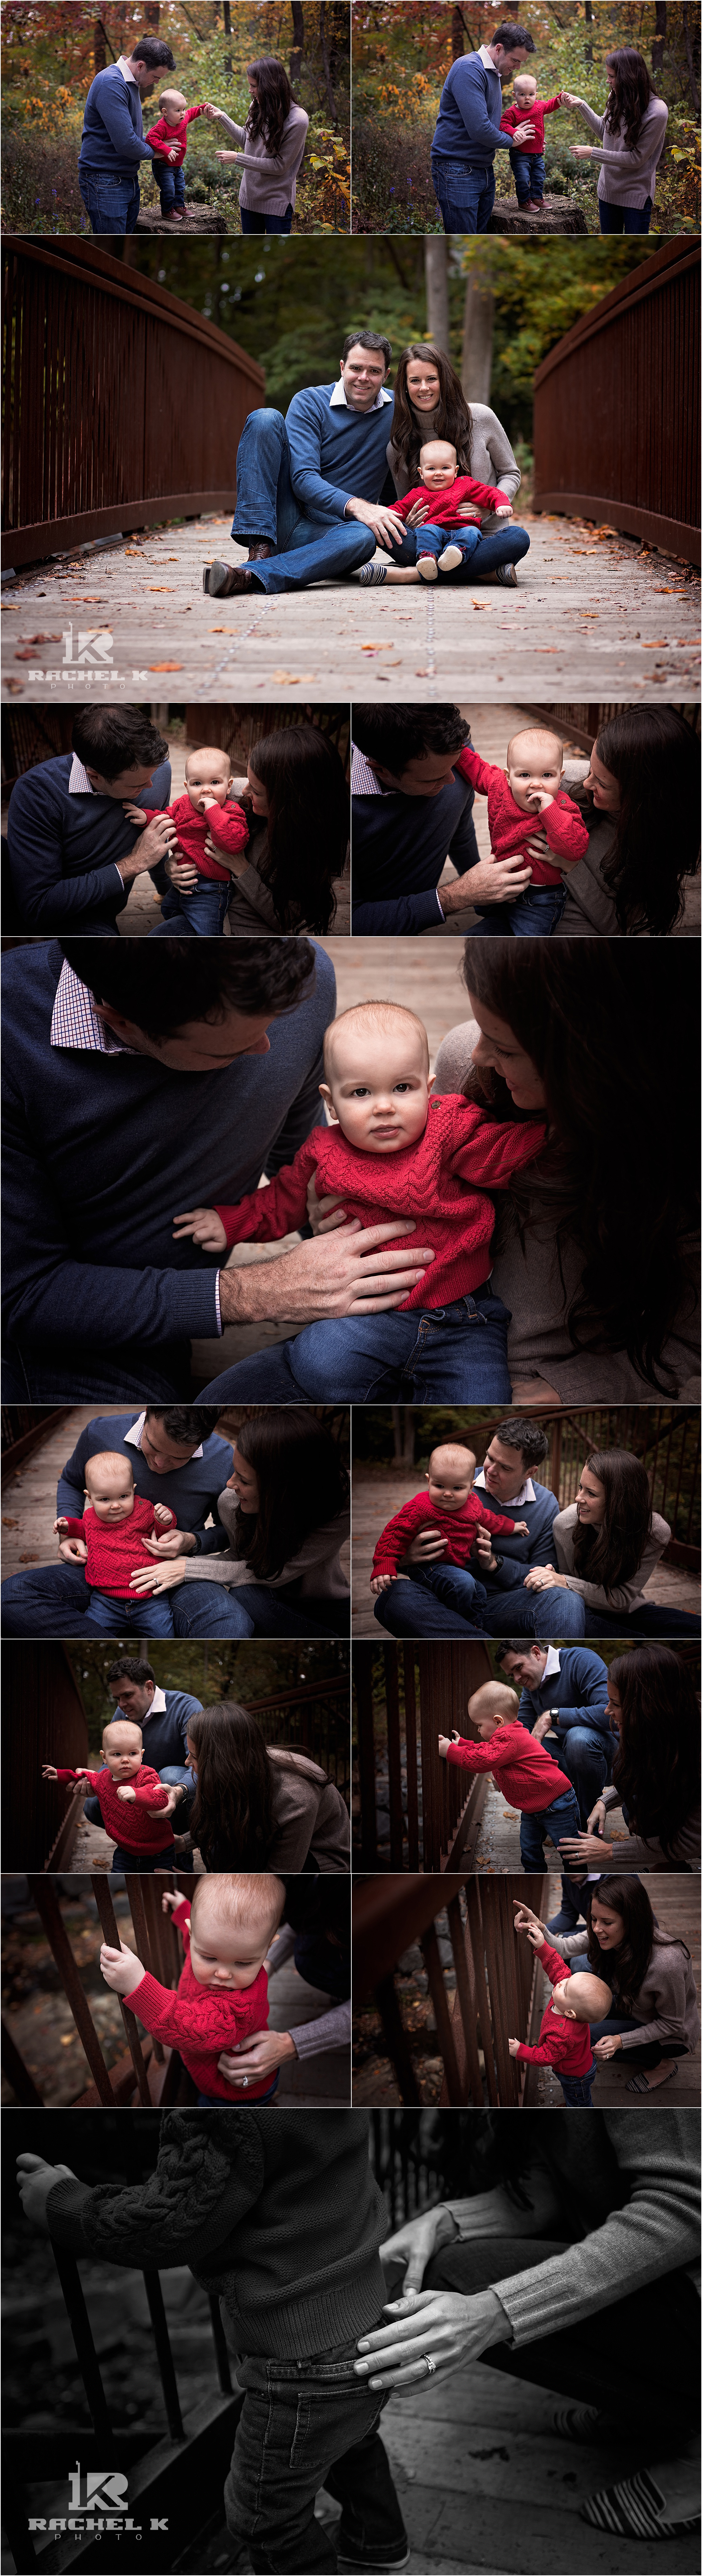 Fall family session with baby by Arlington Virginia family photographer Rachel K Photo